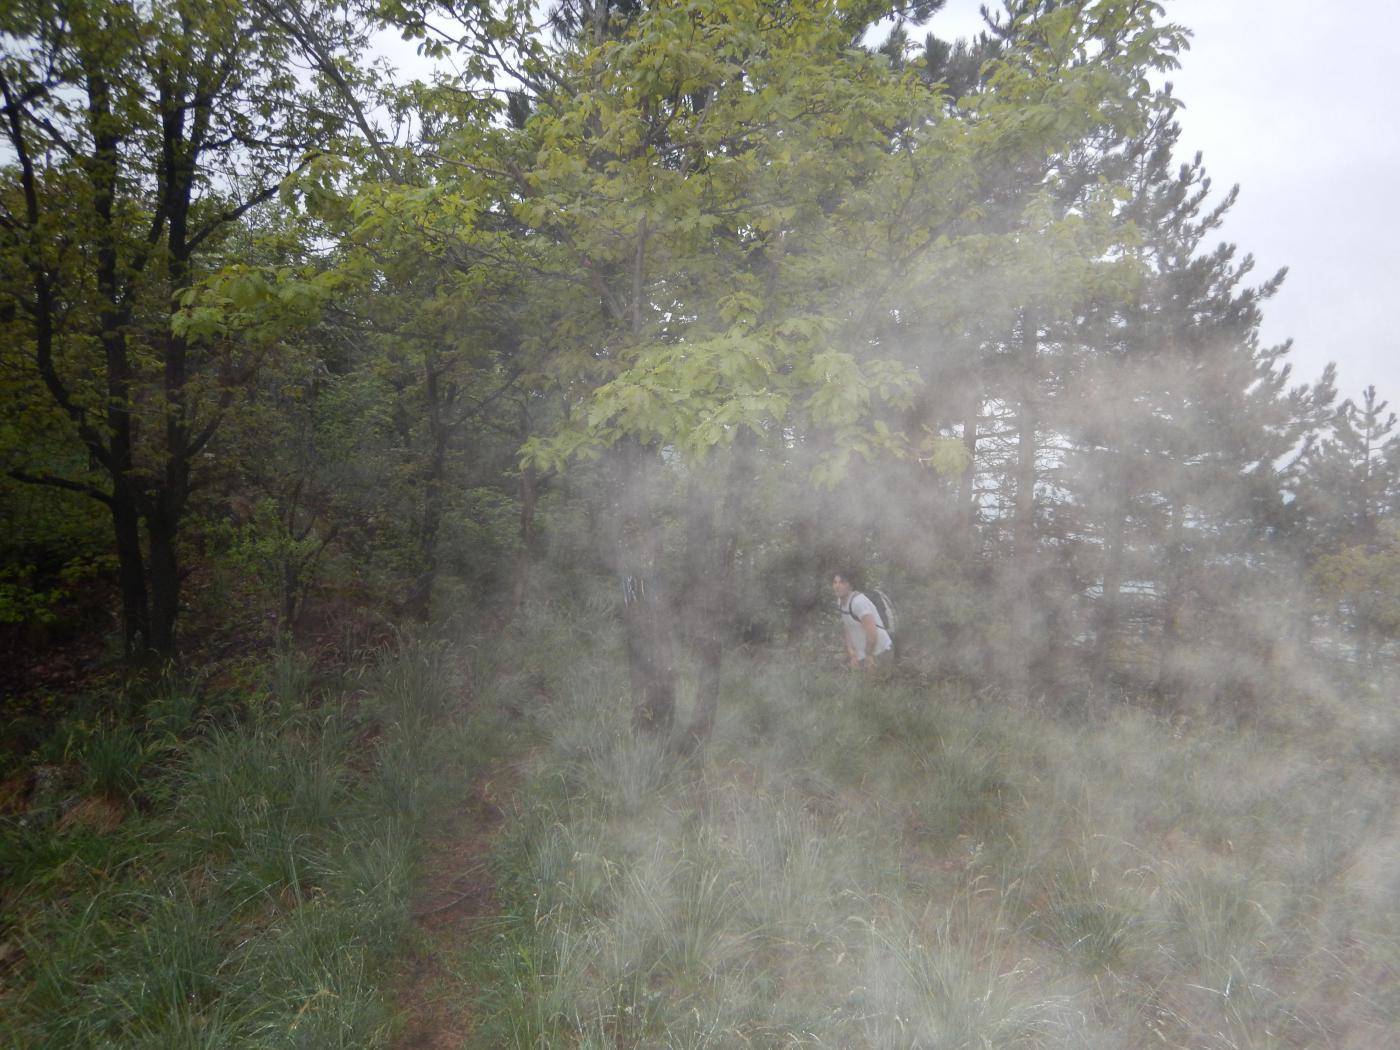 4-05 Umidità e nebbiolina